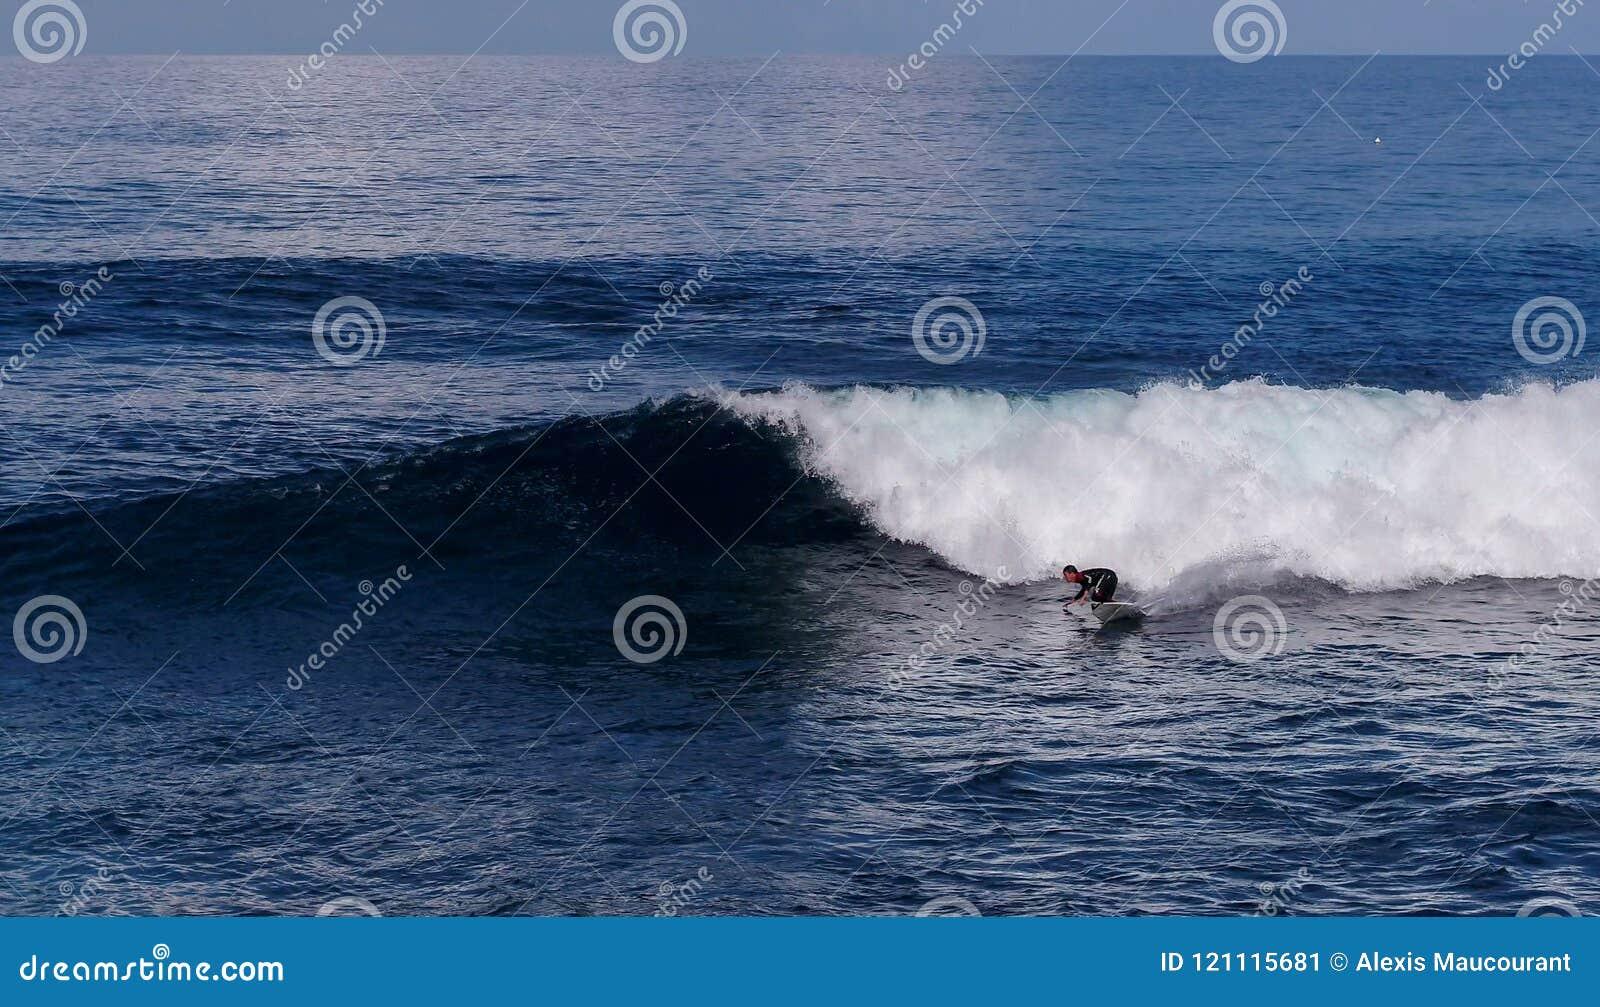 Surfer on fire !